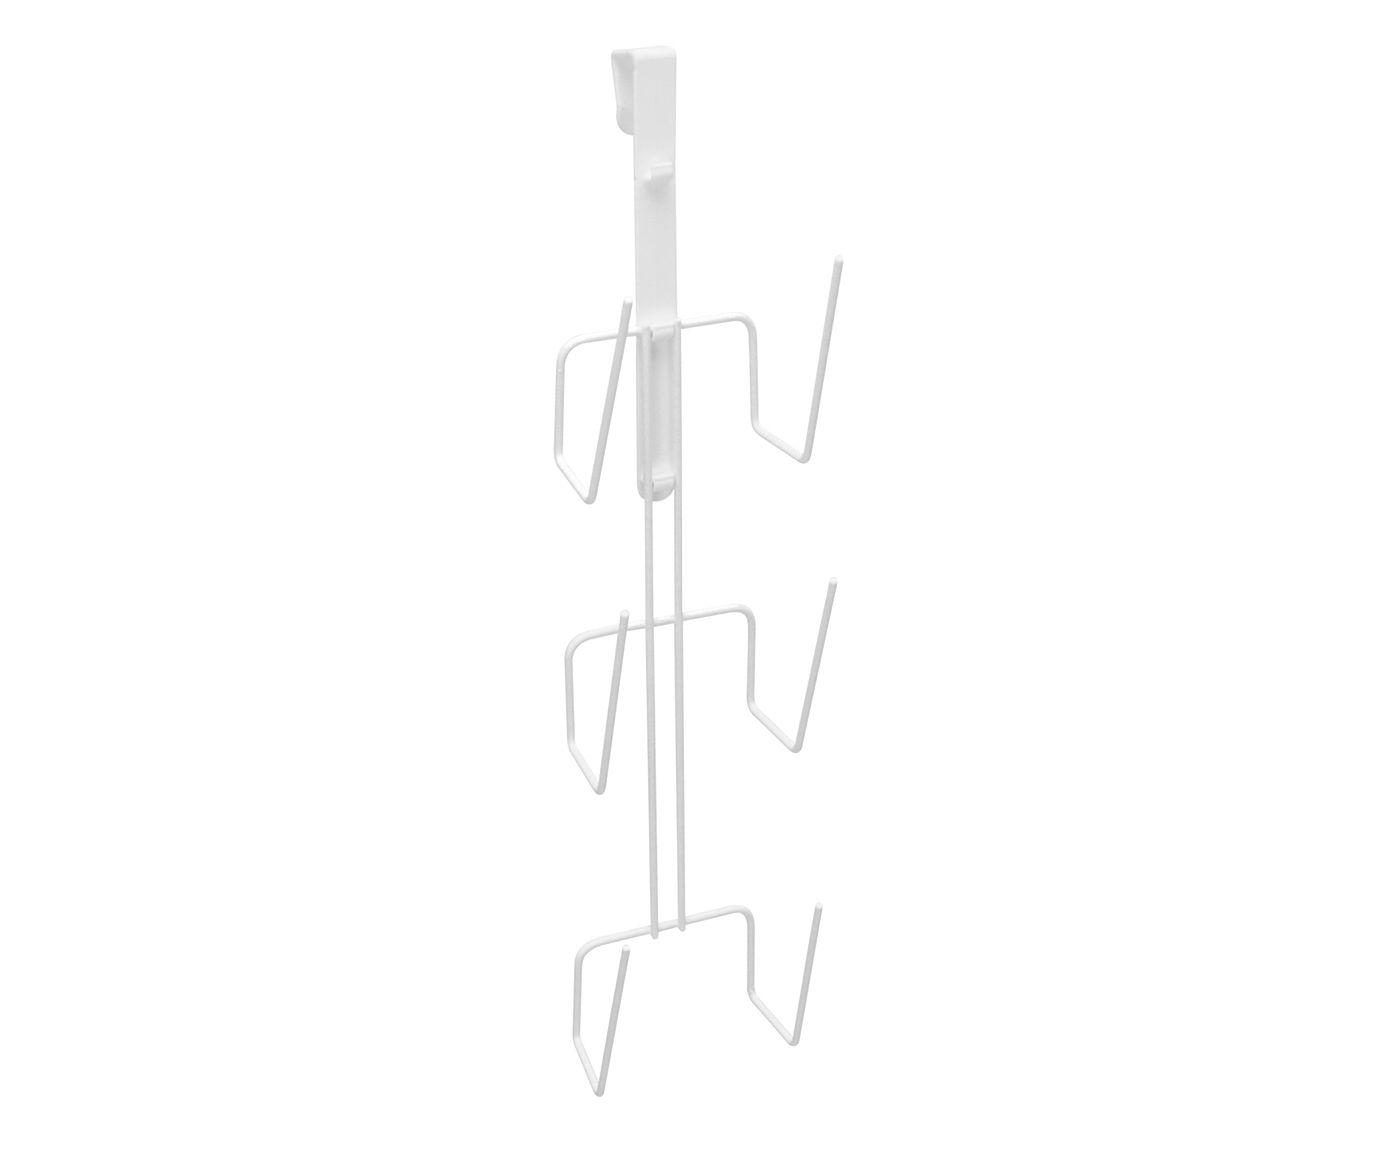 Suporte para Tampas Ualking Branco - 10X40X7,5cm | Westwing.com.br